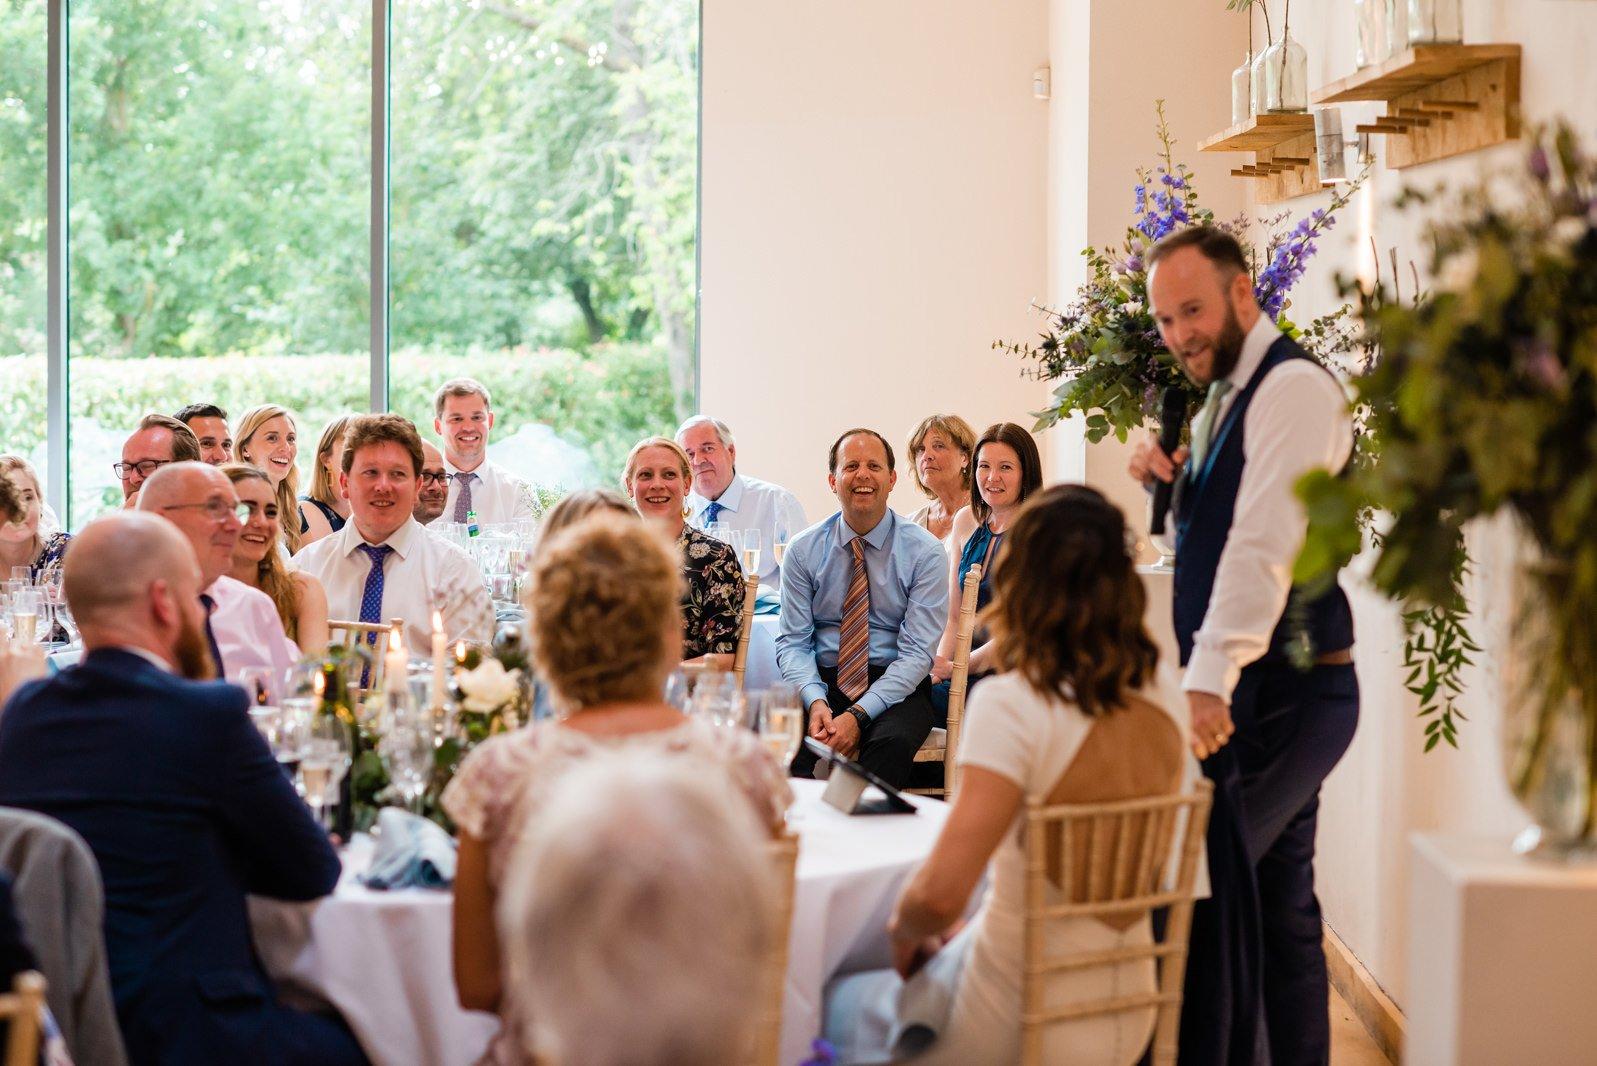 Millbridge Court Wedding - stunning summer wedding - wedding photography 96